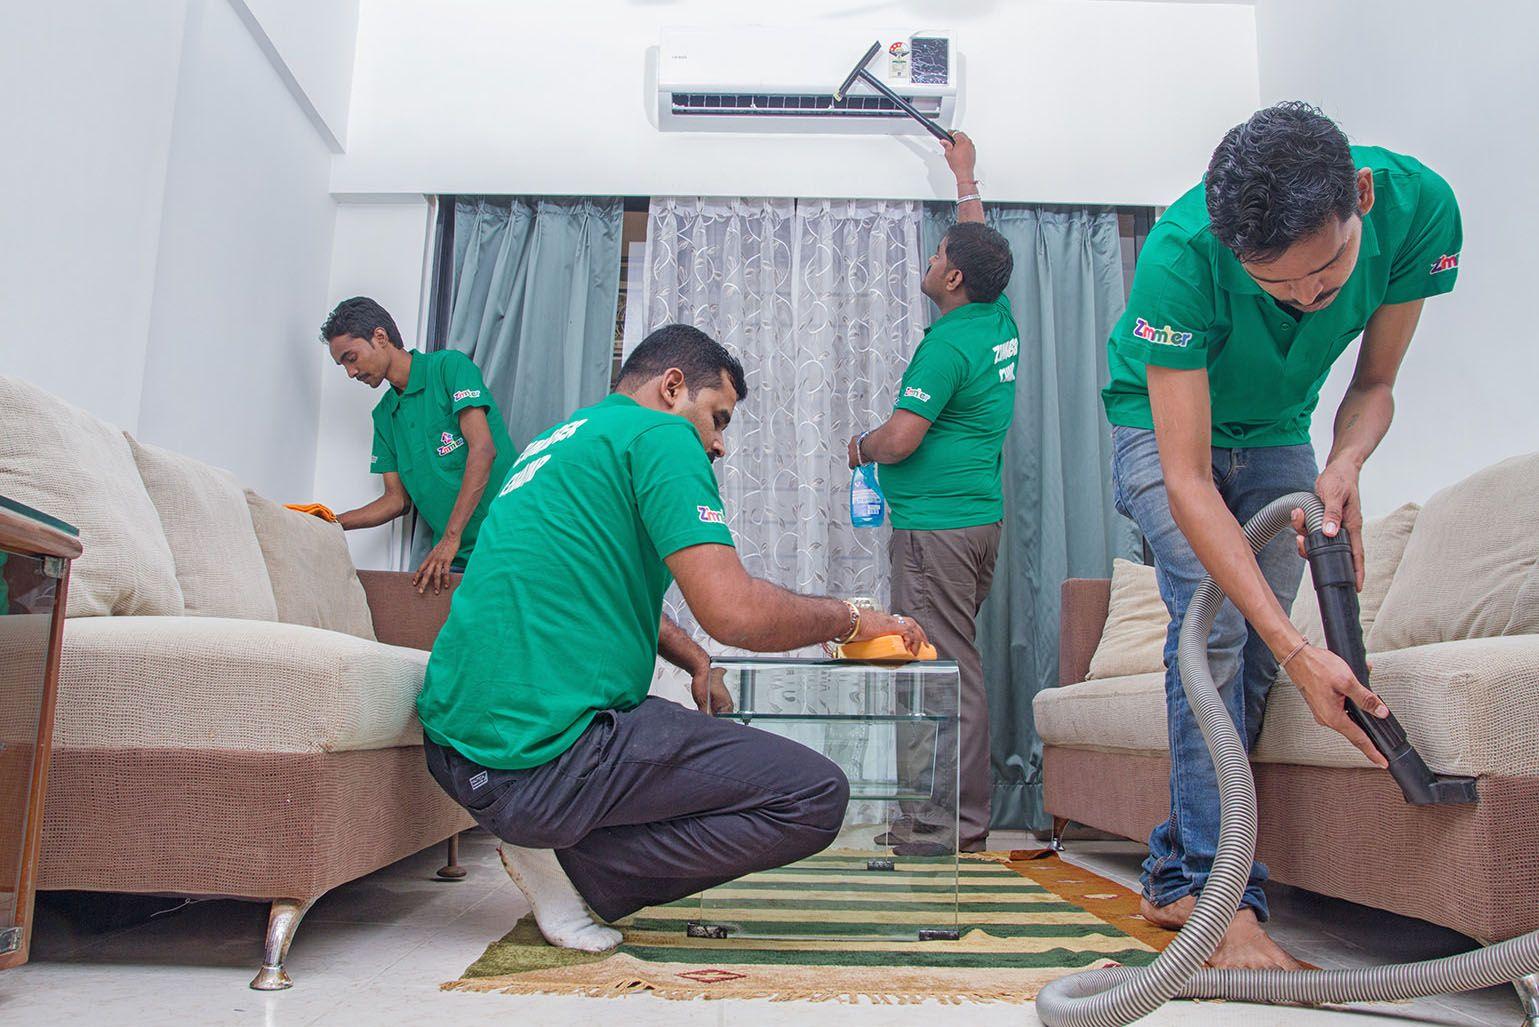 Pin By دليل الكويت Daleelkw On خدمات دليل الكويت House Cleaning Services Cleaning Service Cleaning Services Company